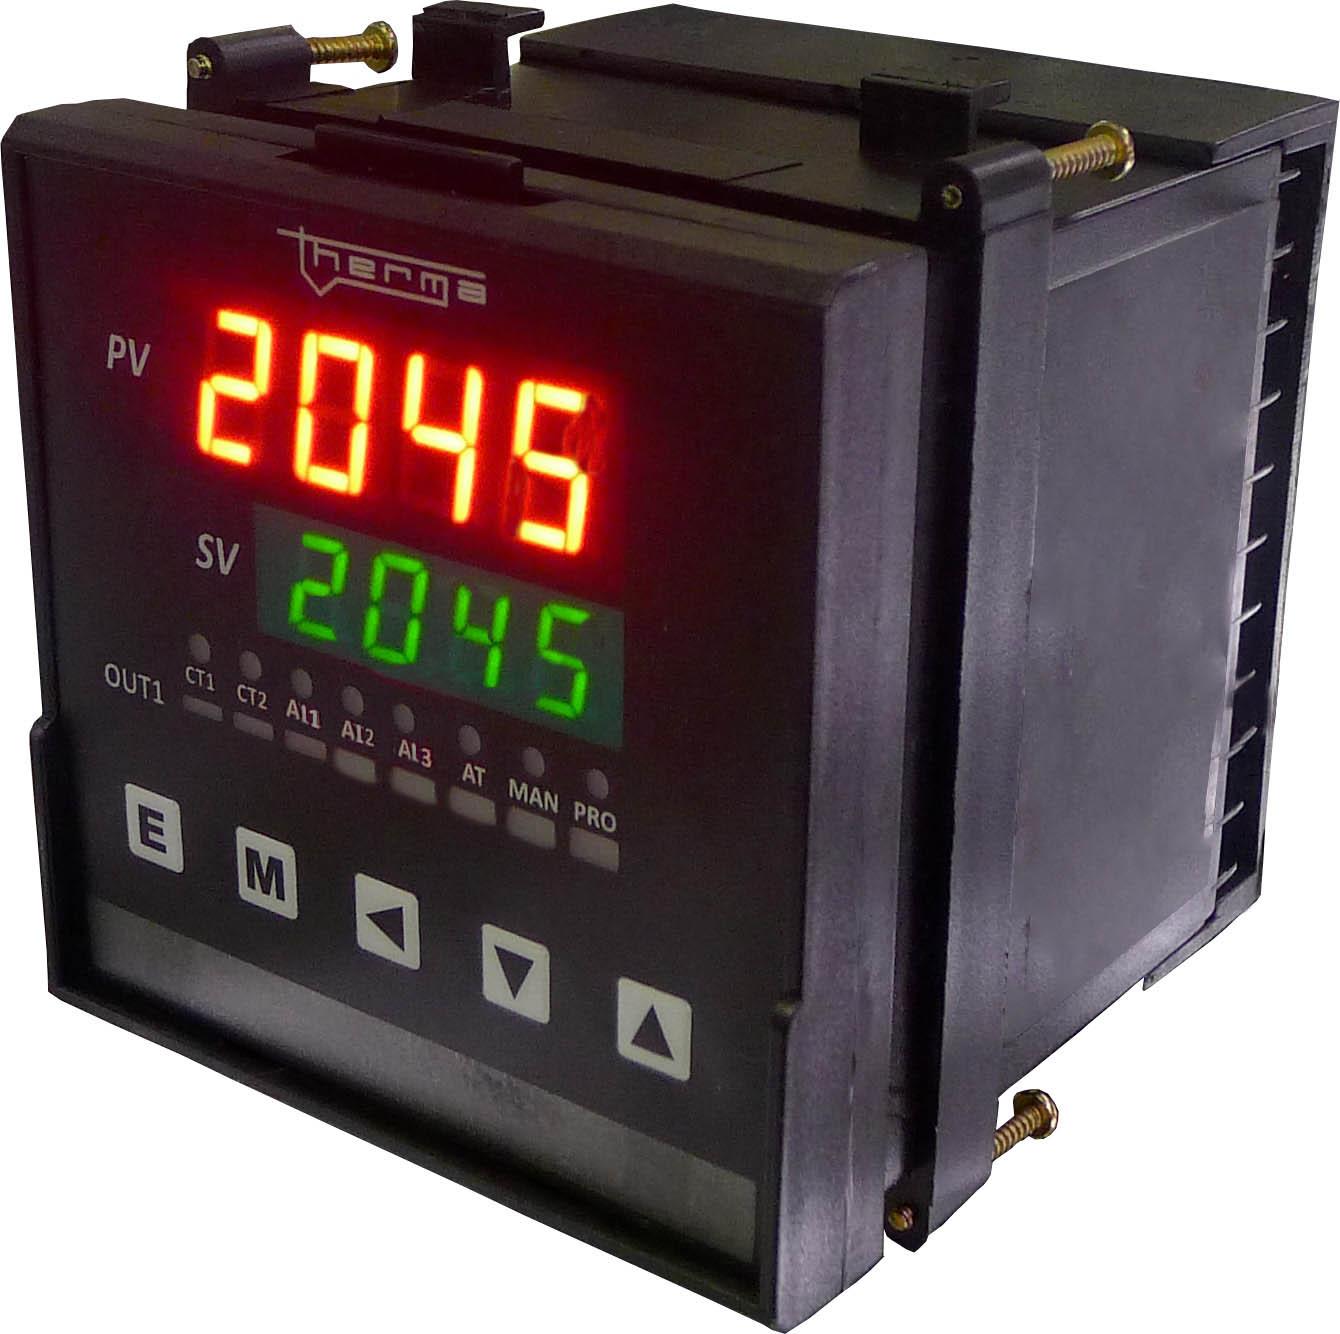 Controlador de Temperatura e Percentual de Carbono TH 2045